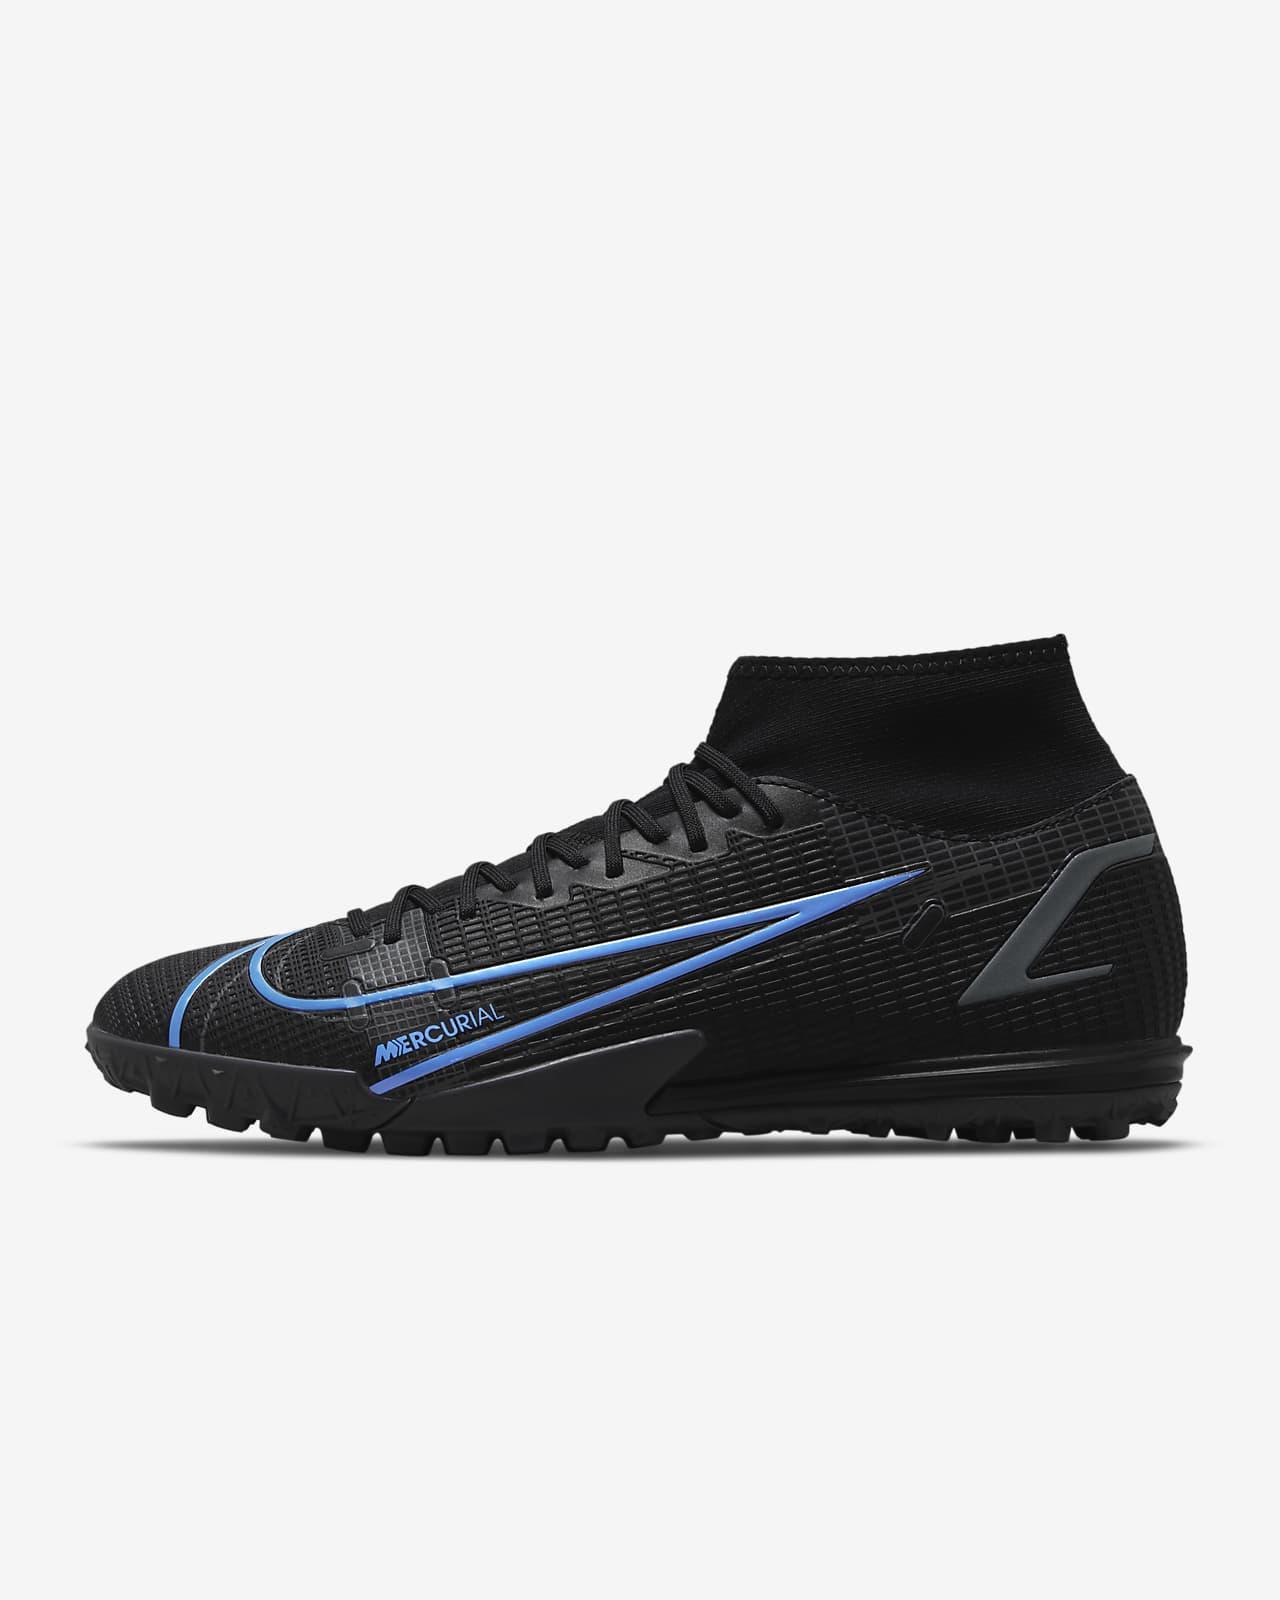 Nike Mercurial Superfly 8 Academy TF Turf Football Shoes